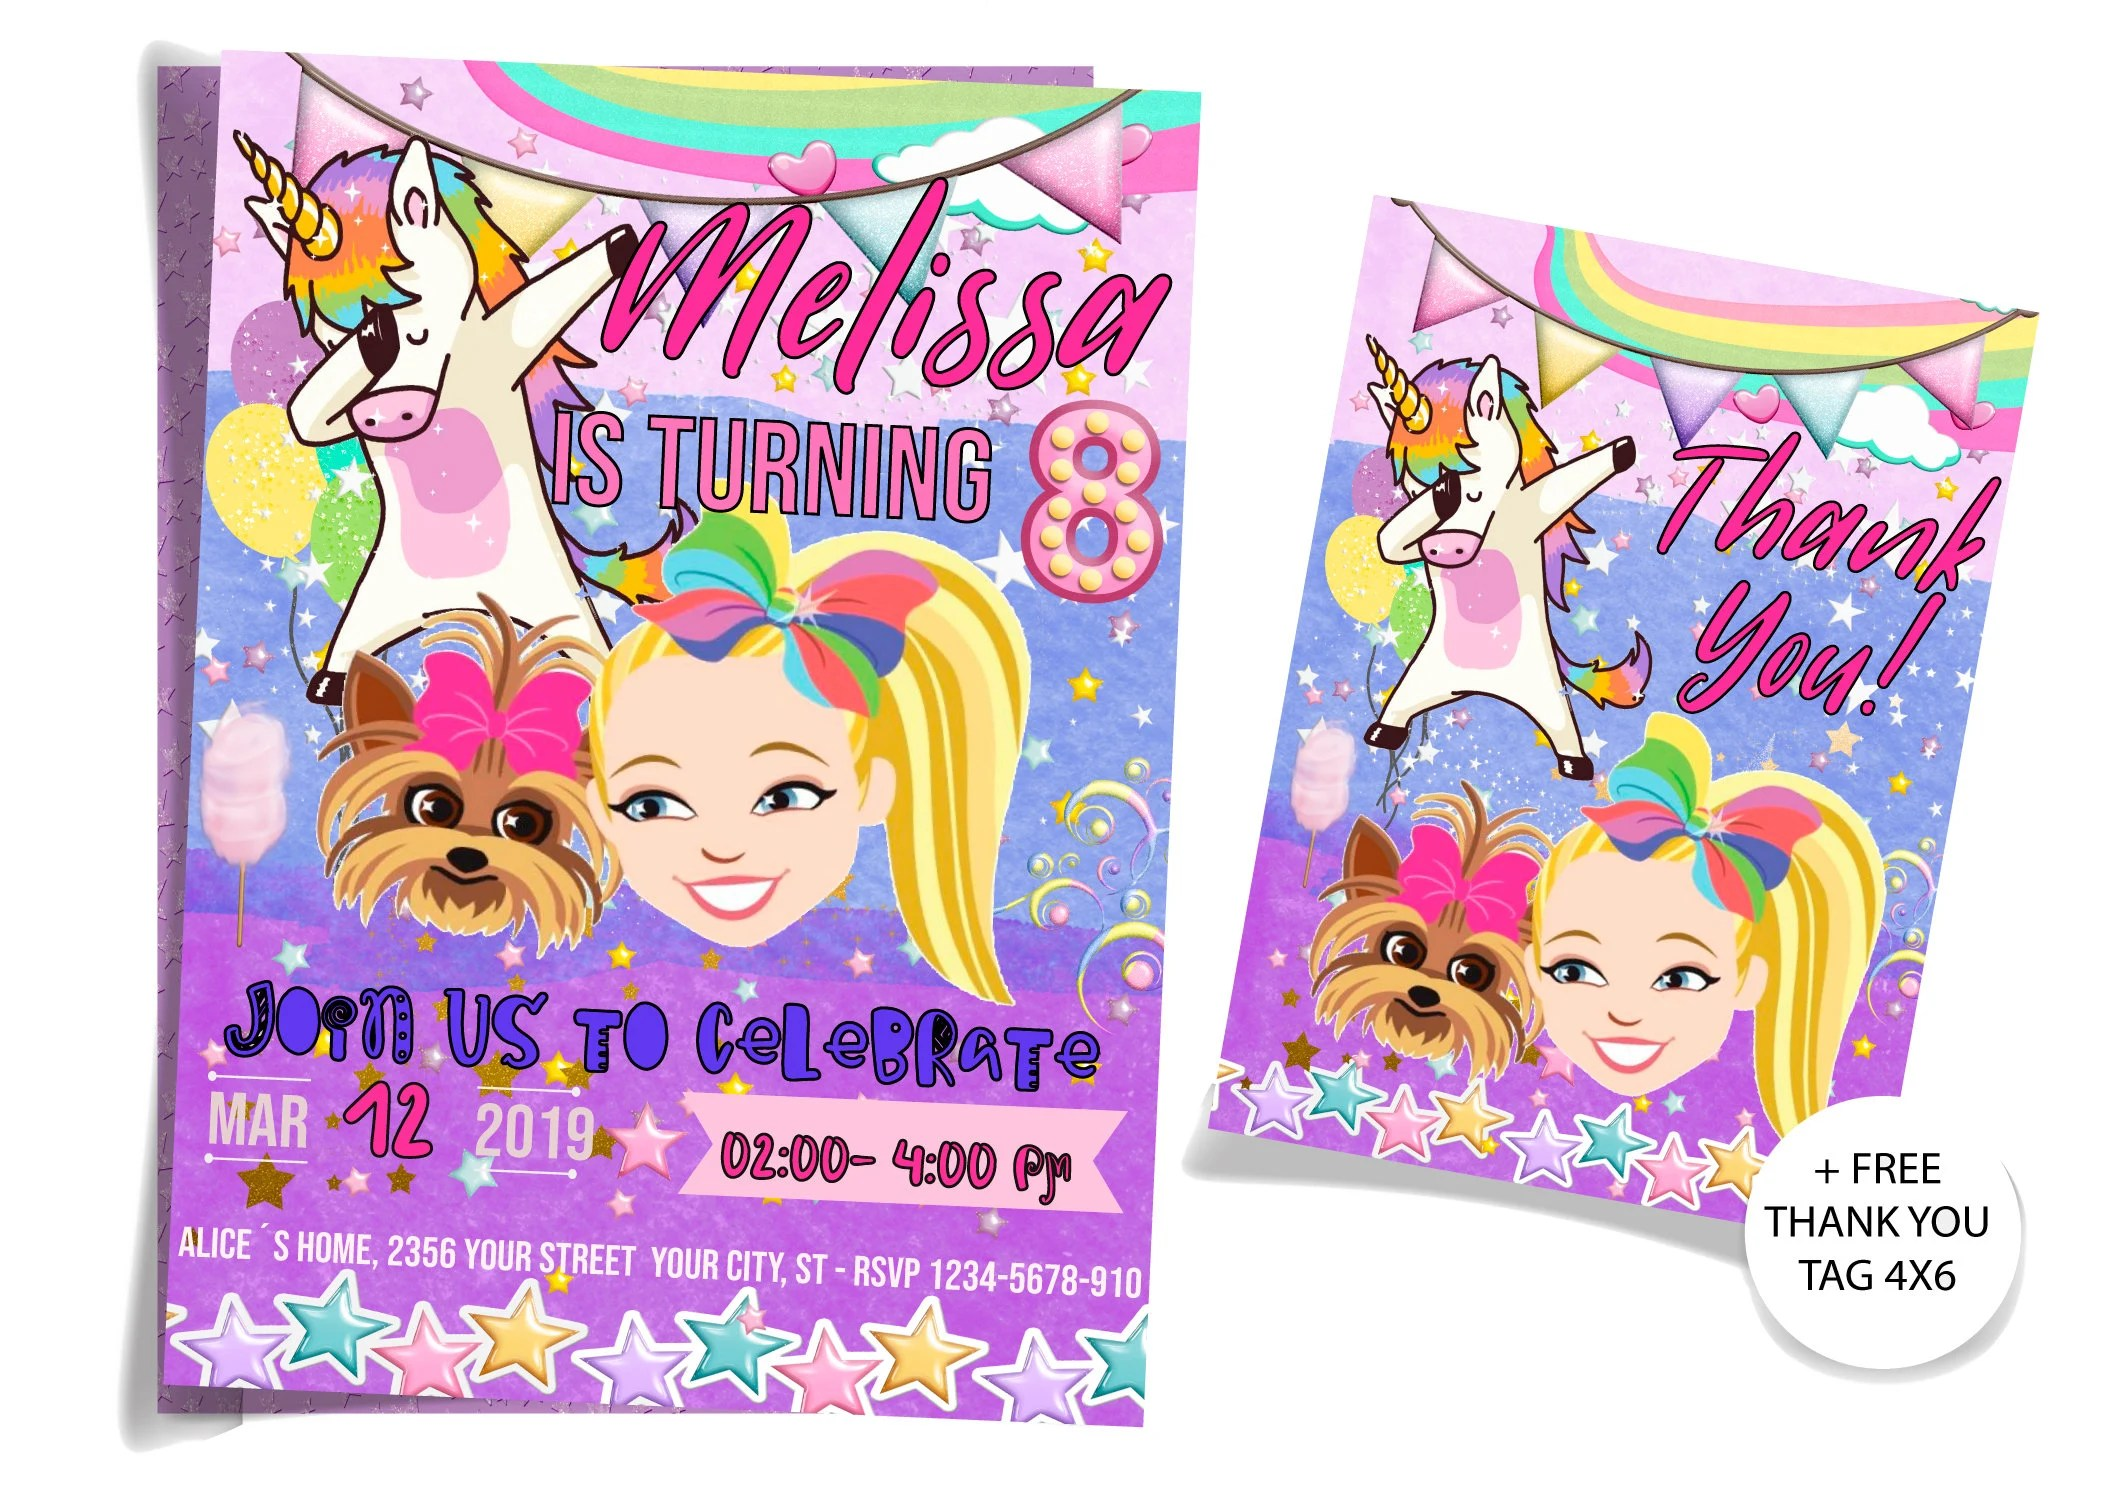 jojo siwa invitation jojo siwa invitations jojo siwa birthday invitation jojo siwa party invitation jojo siwa invitation template